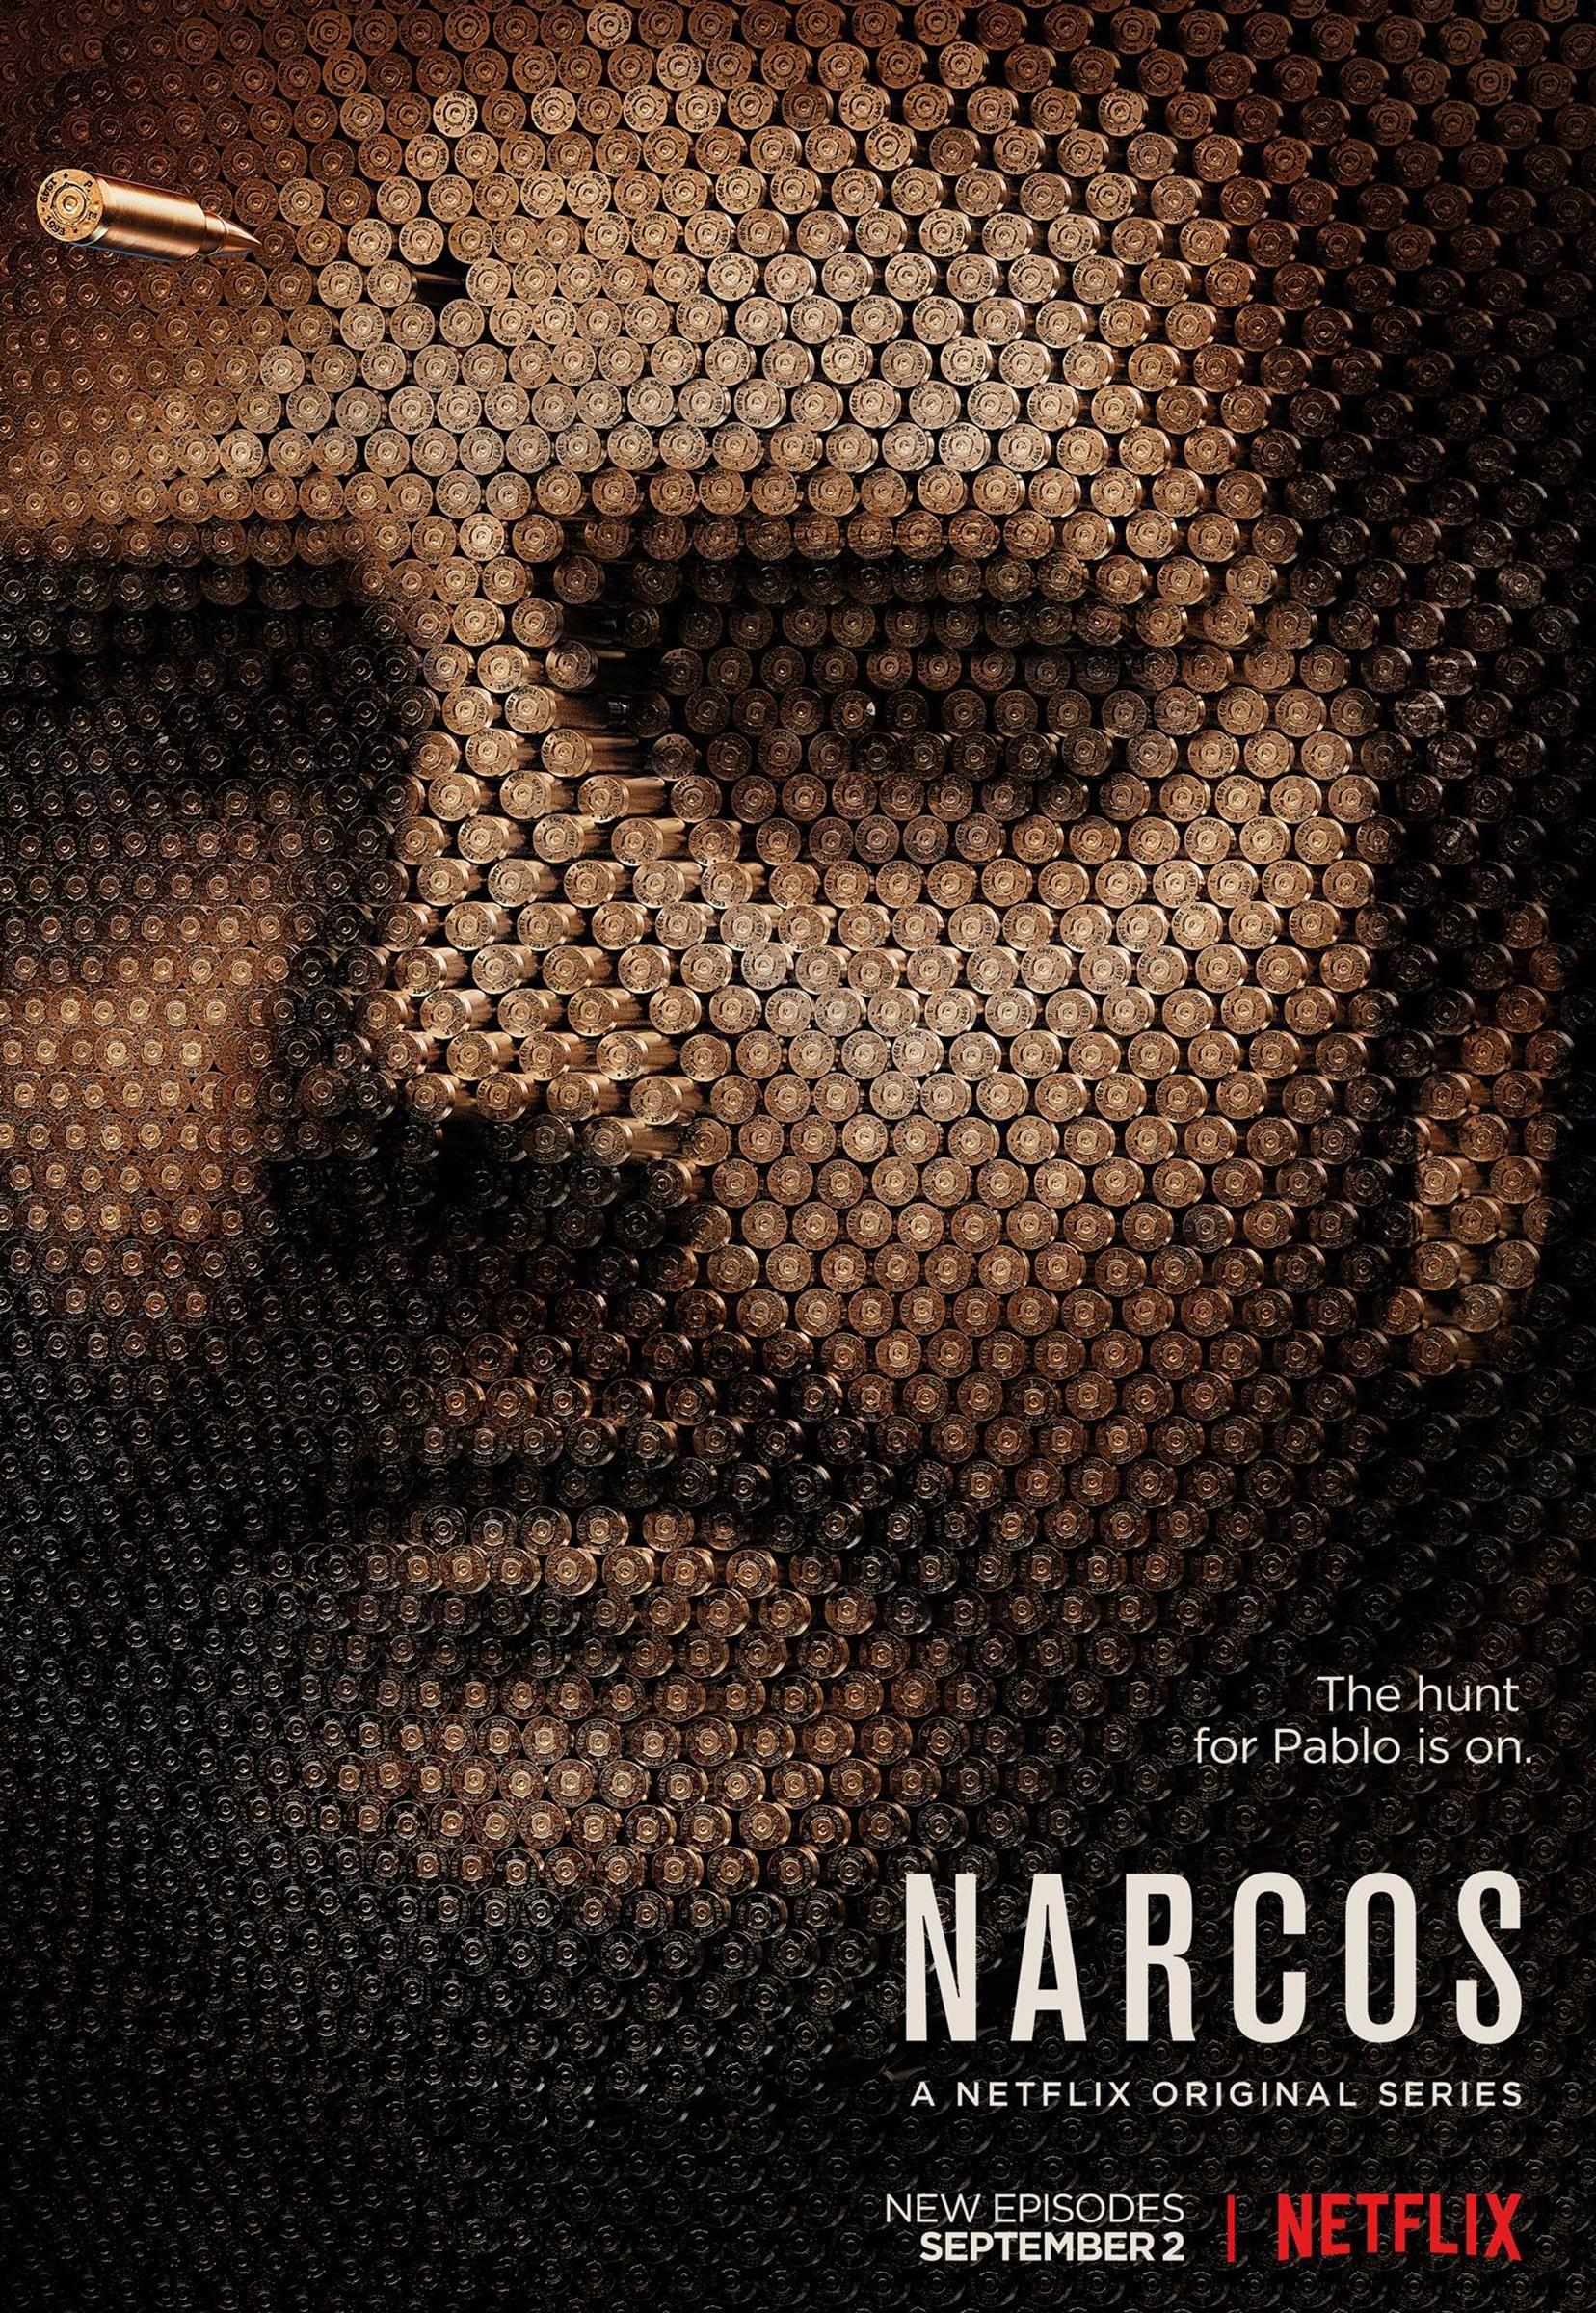 Netflix / Narcos: Narcos Season 2, Bullet Face | Ads of the World ...